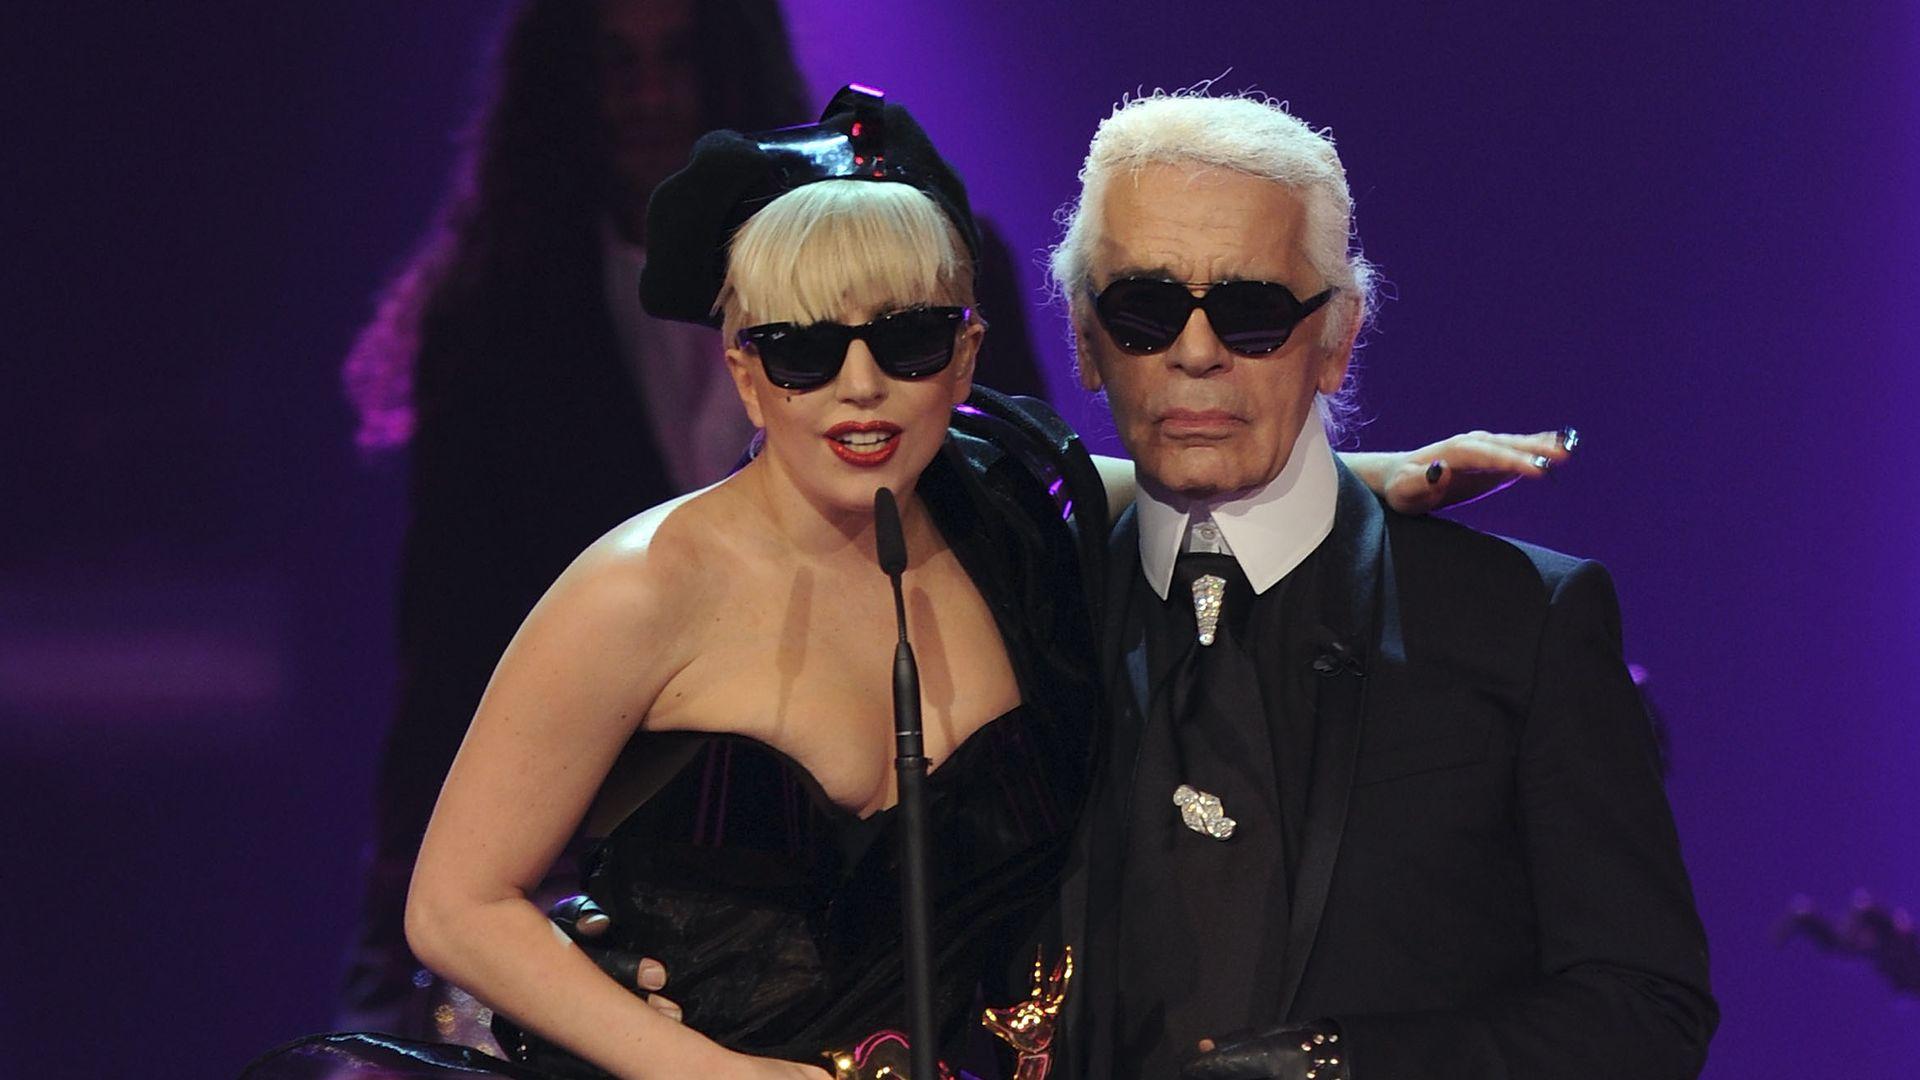 Vornehm blass: Lady GaGa spektakulär unspektakulär